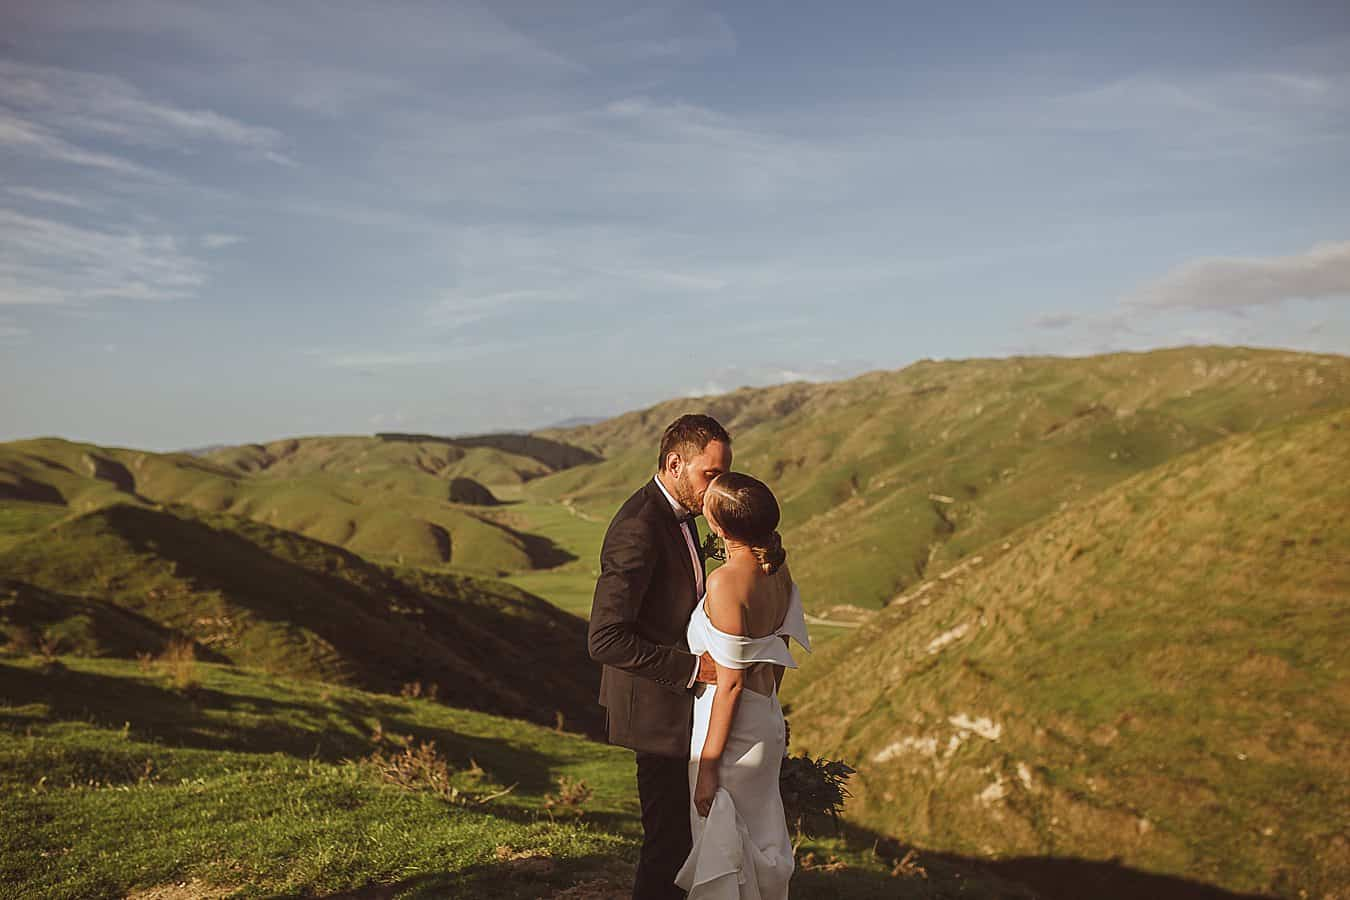 Wellington Wedding Photographer aaeecdaaeccdcc